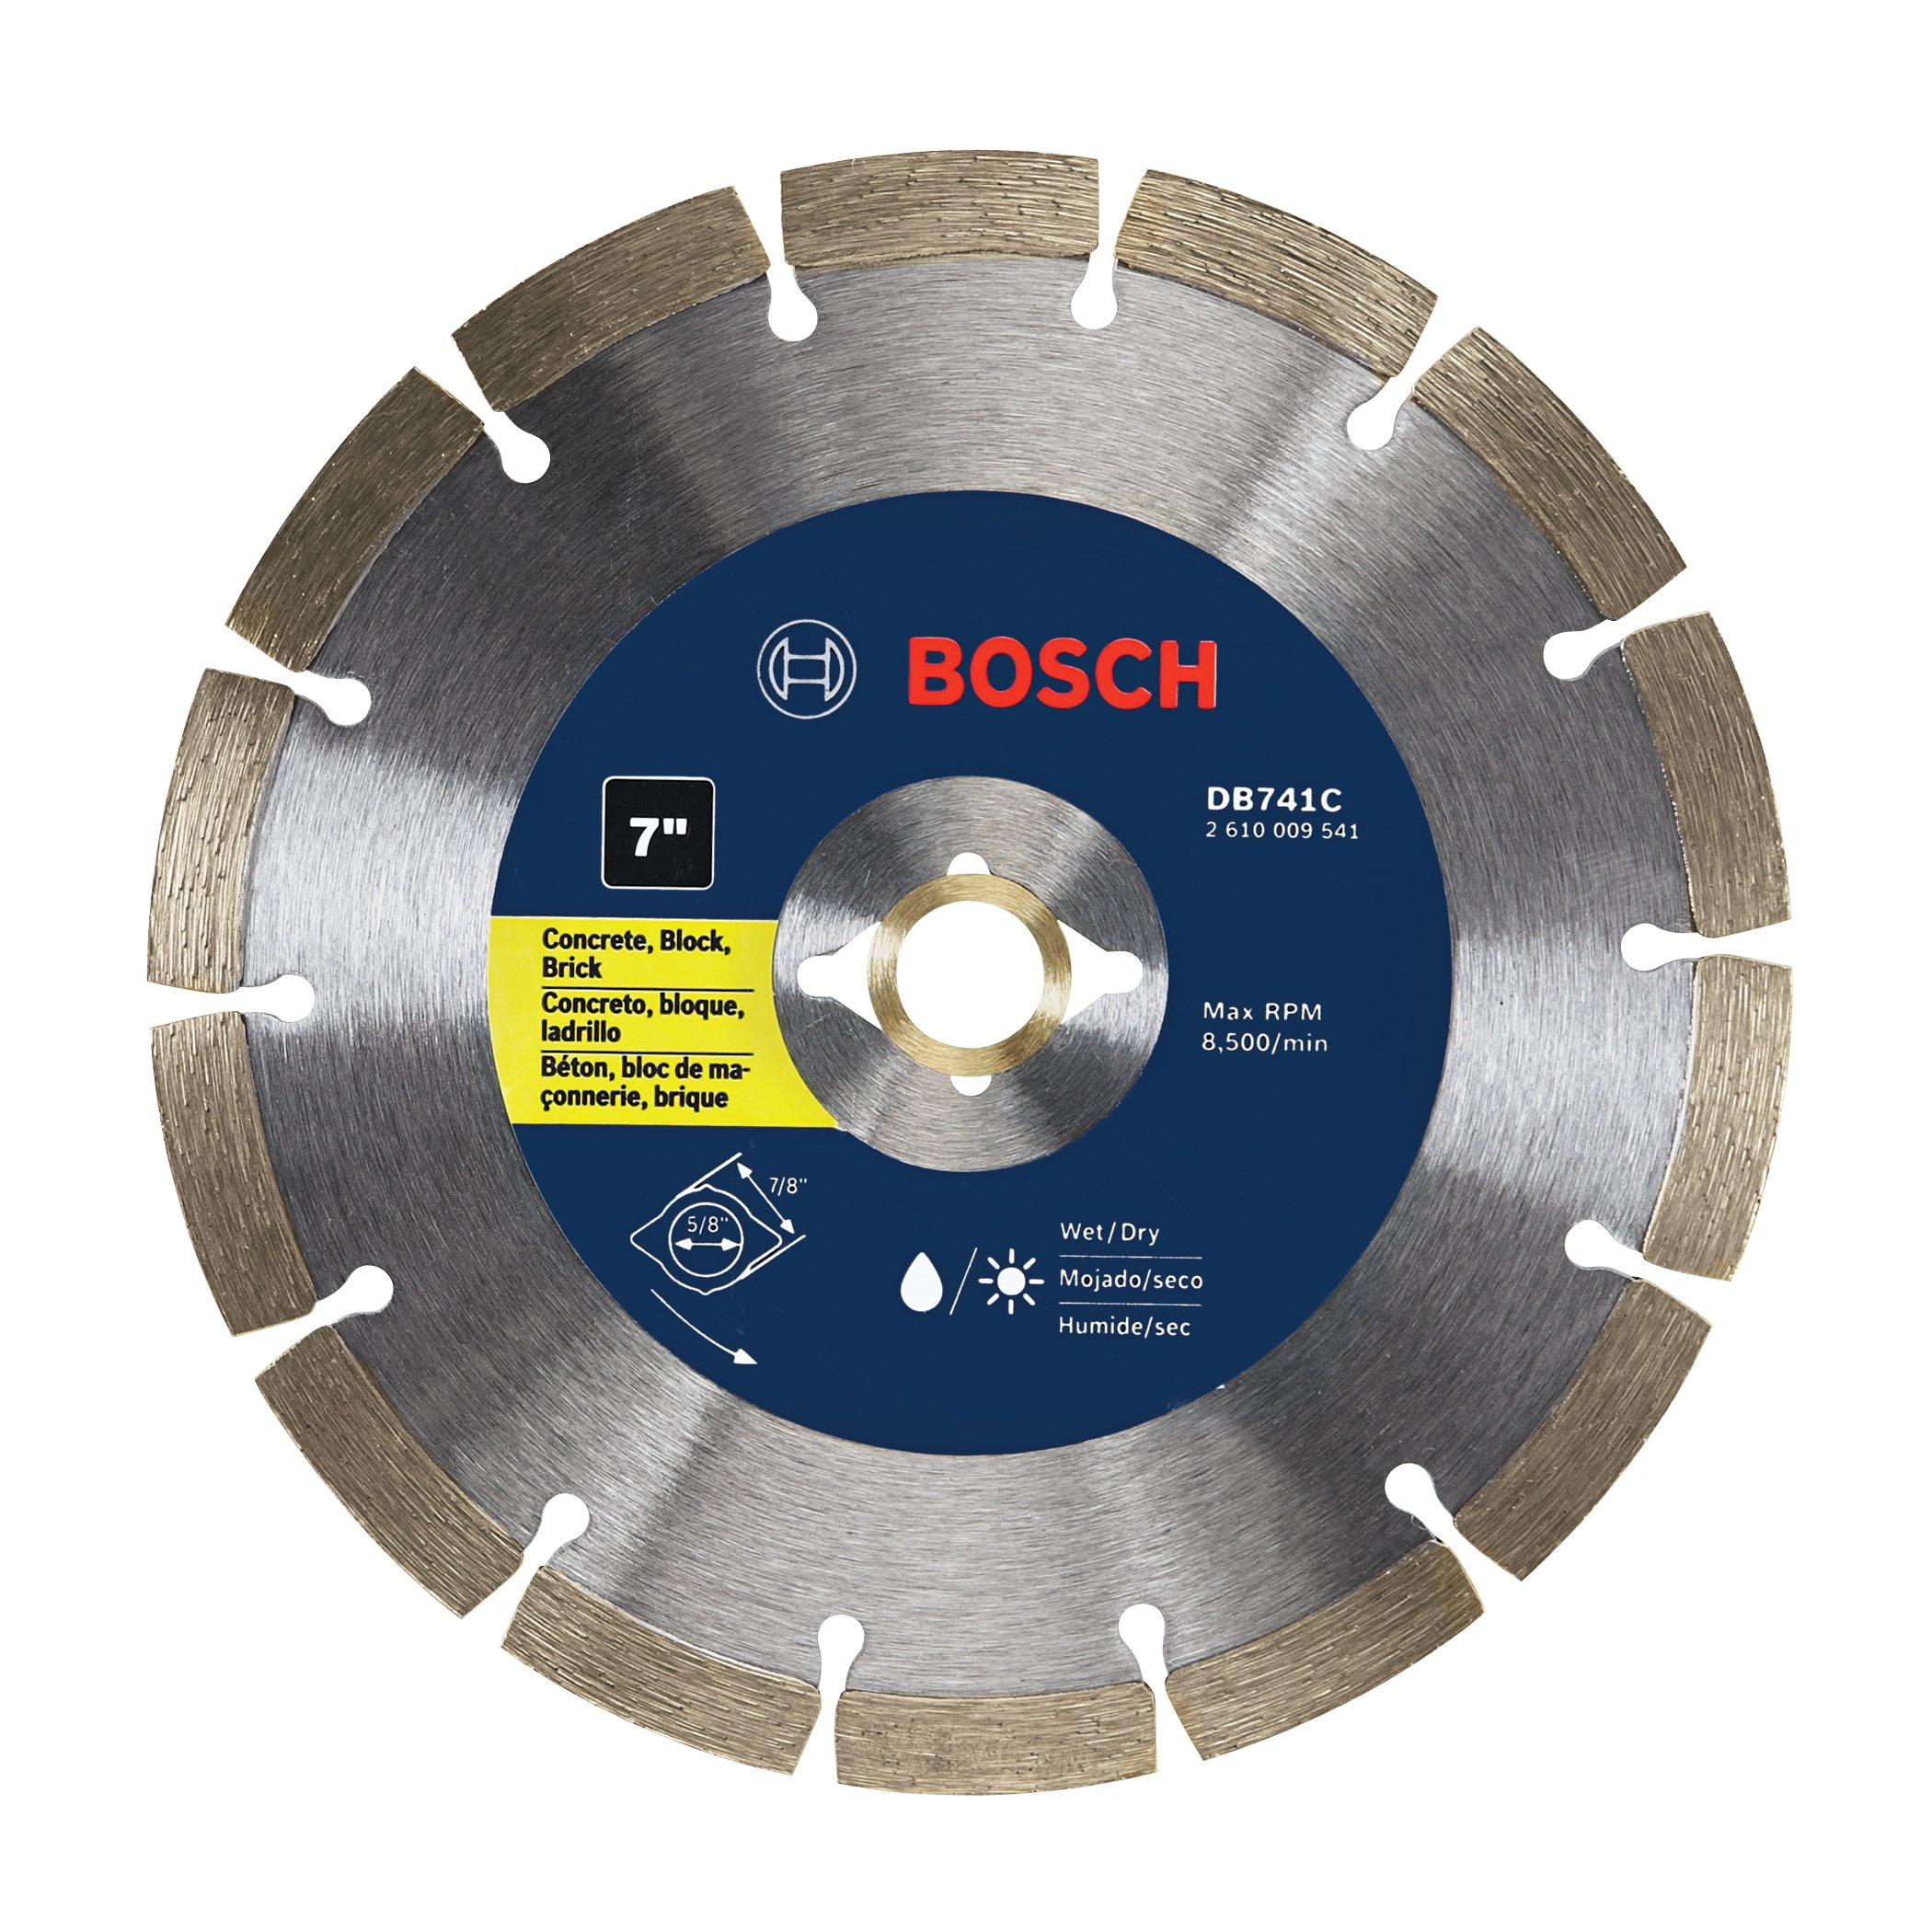 Disco de Diamante BOSCH DB741C segmentado premium de 7 pulg.